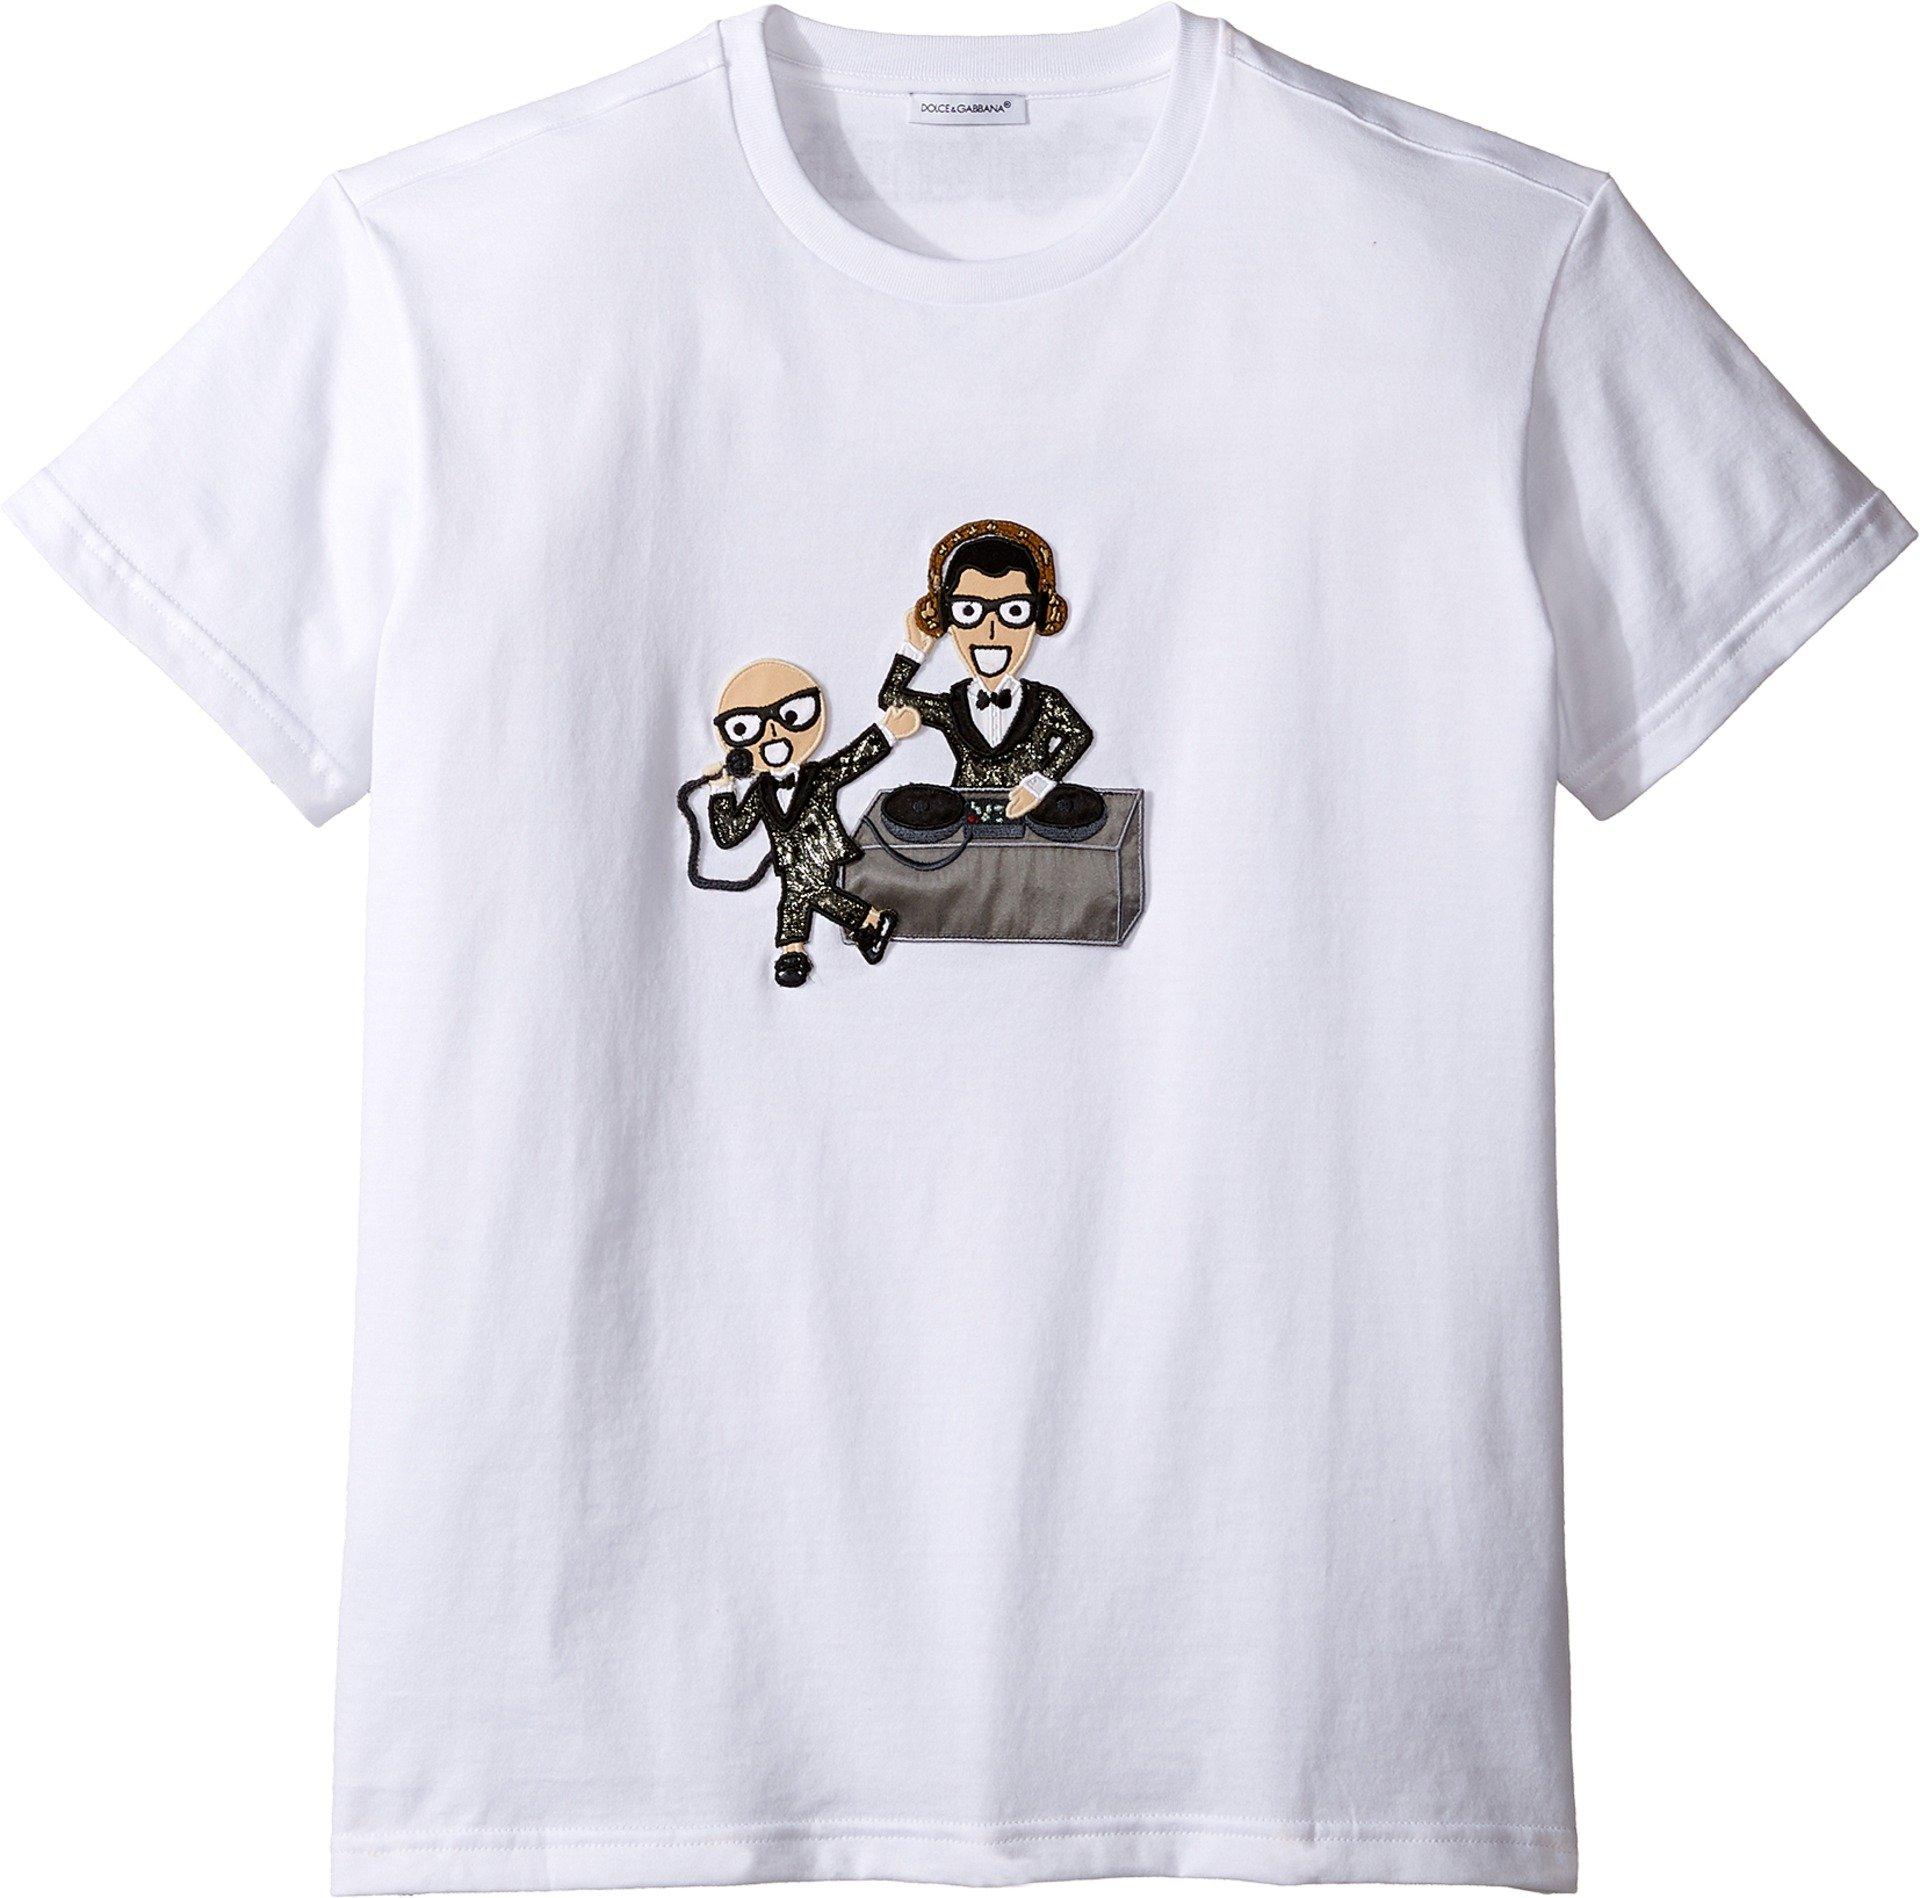 Dolce & Gabbana Kids Boy's Designers Tee (Big Kids) White Print T-Shirt